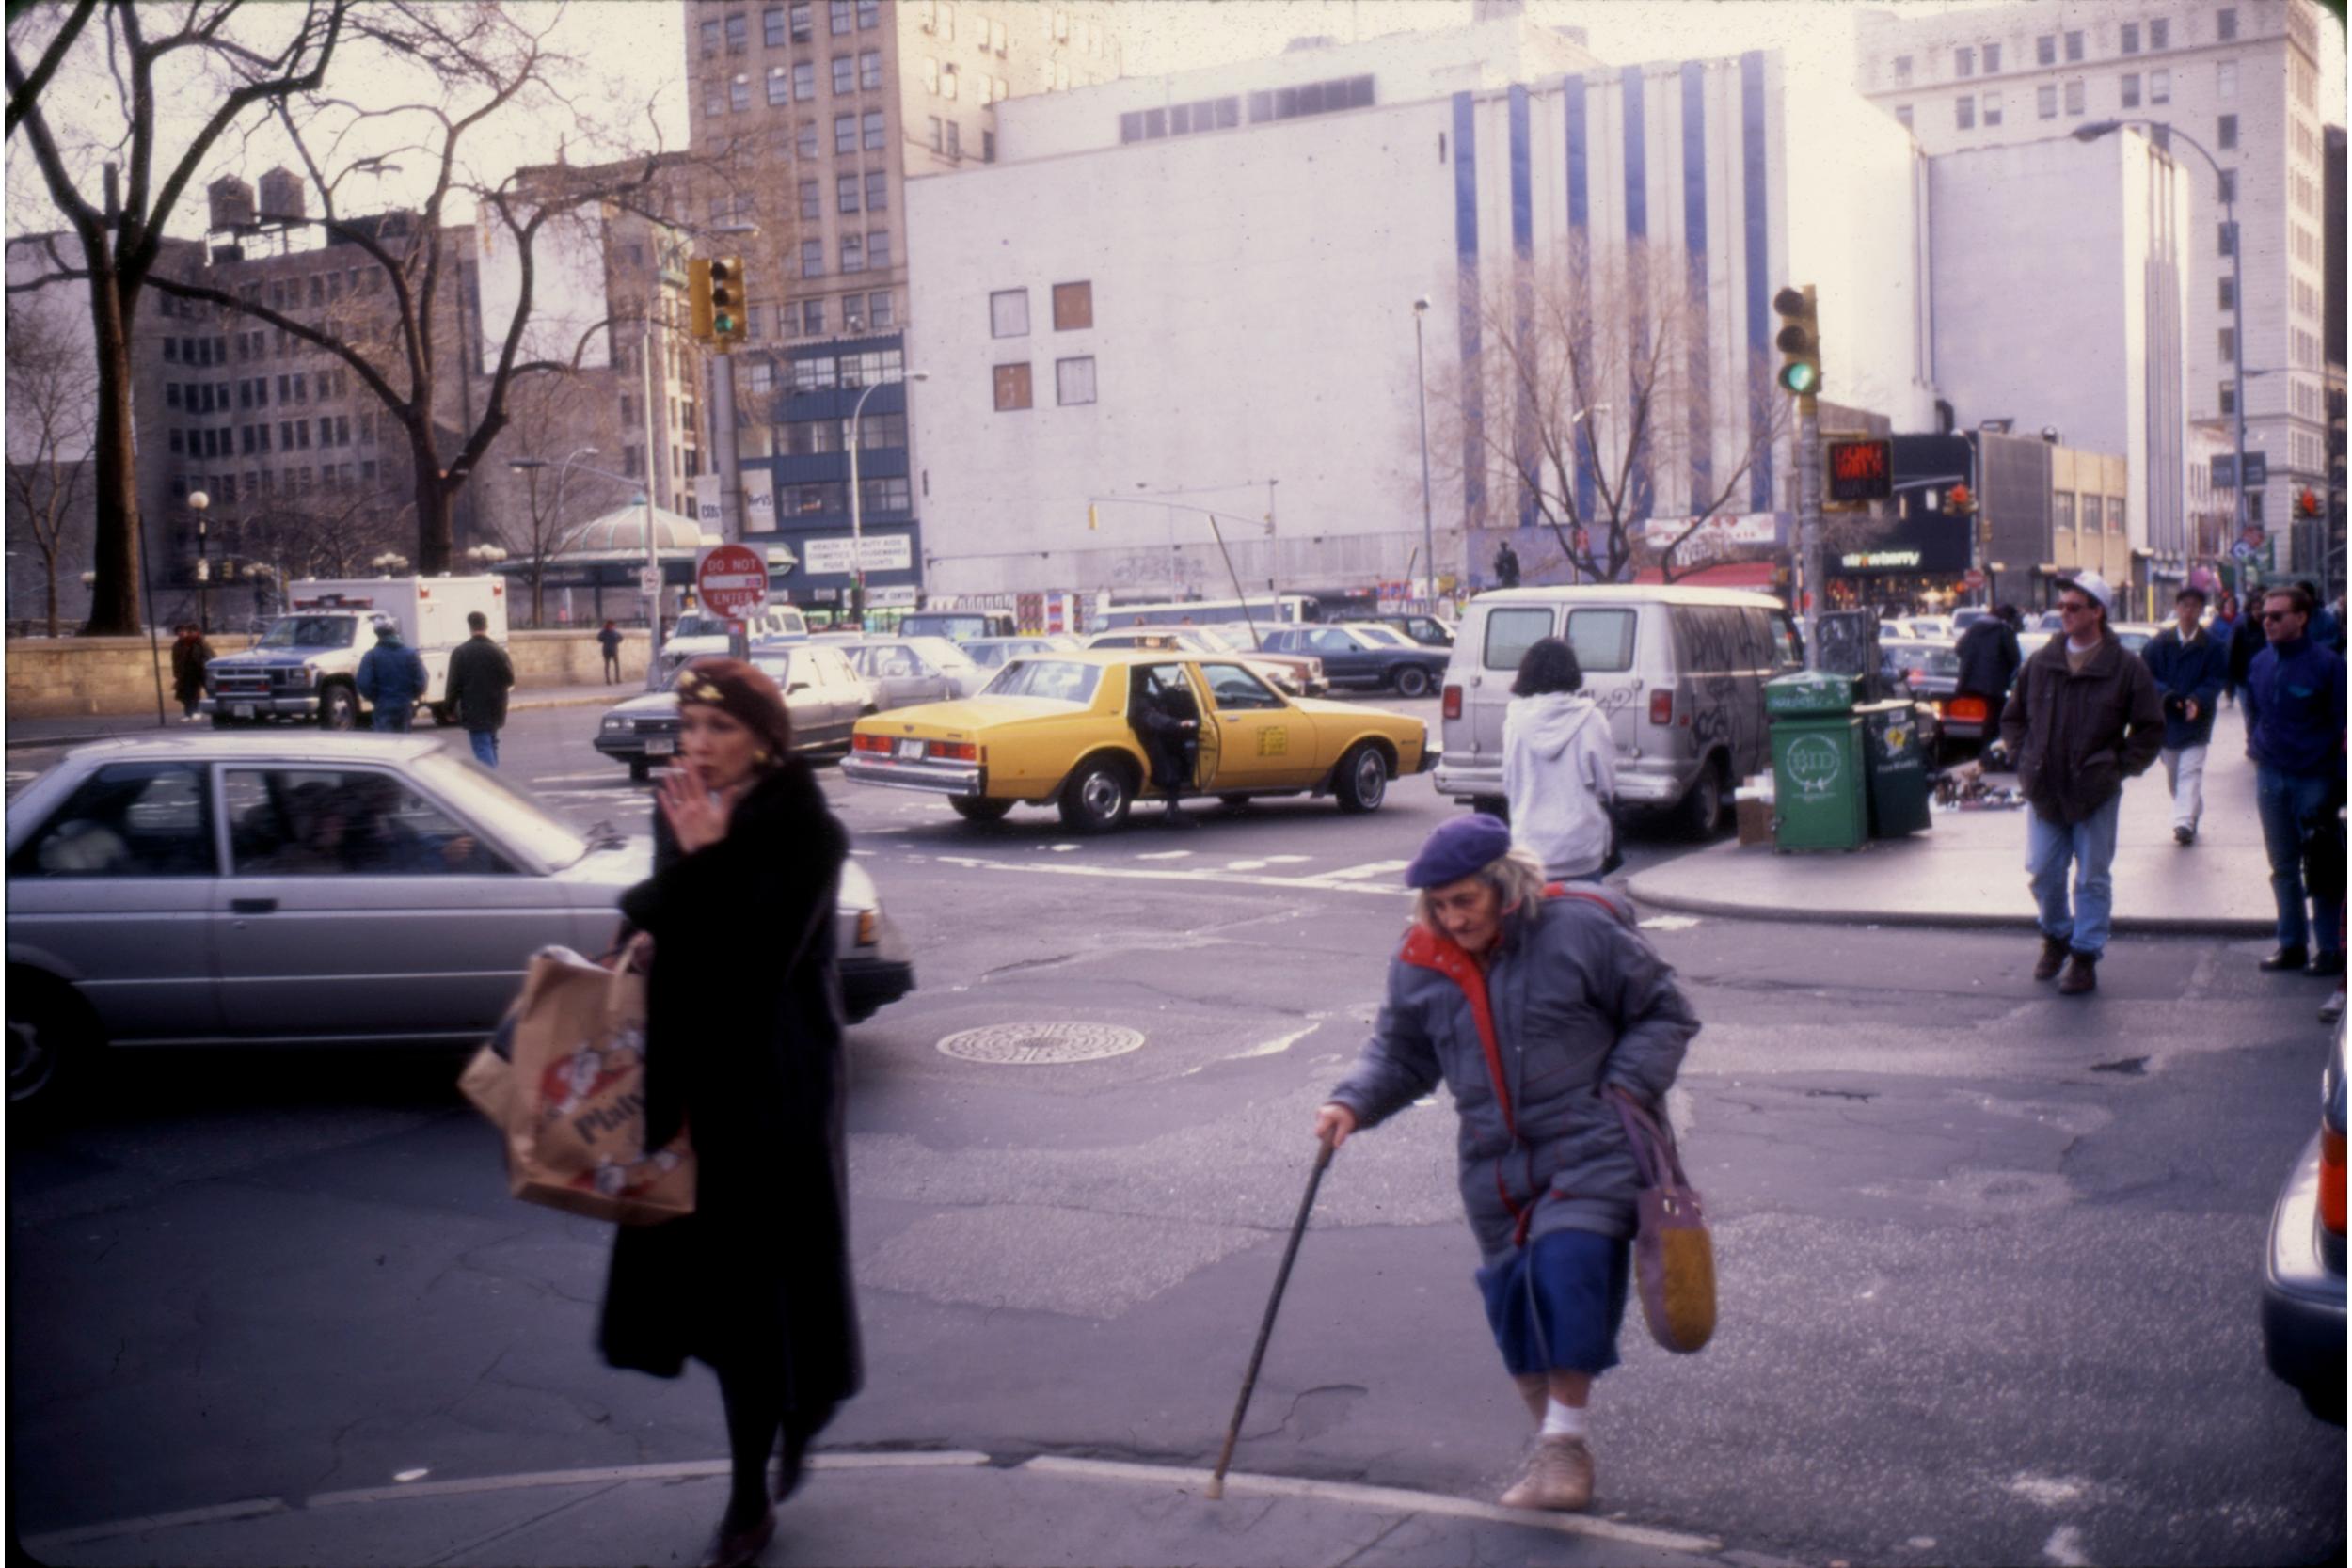 Union Square, January 1993